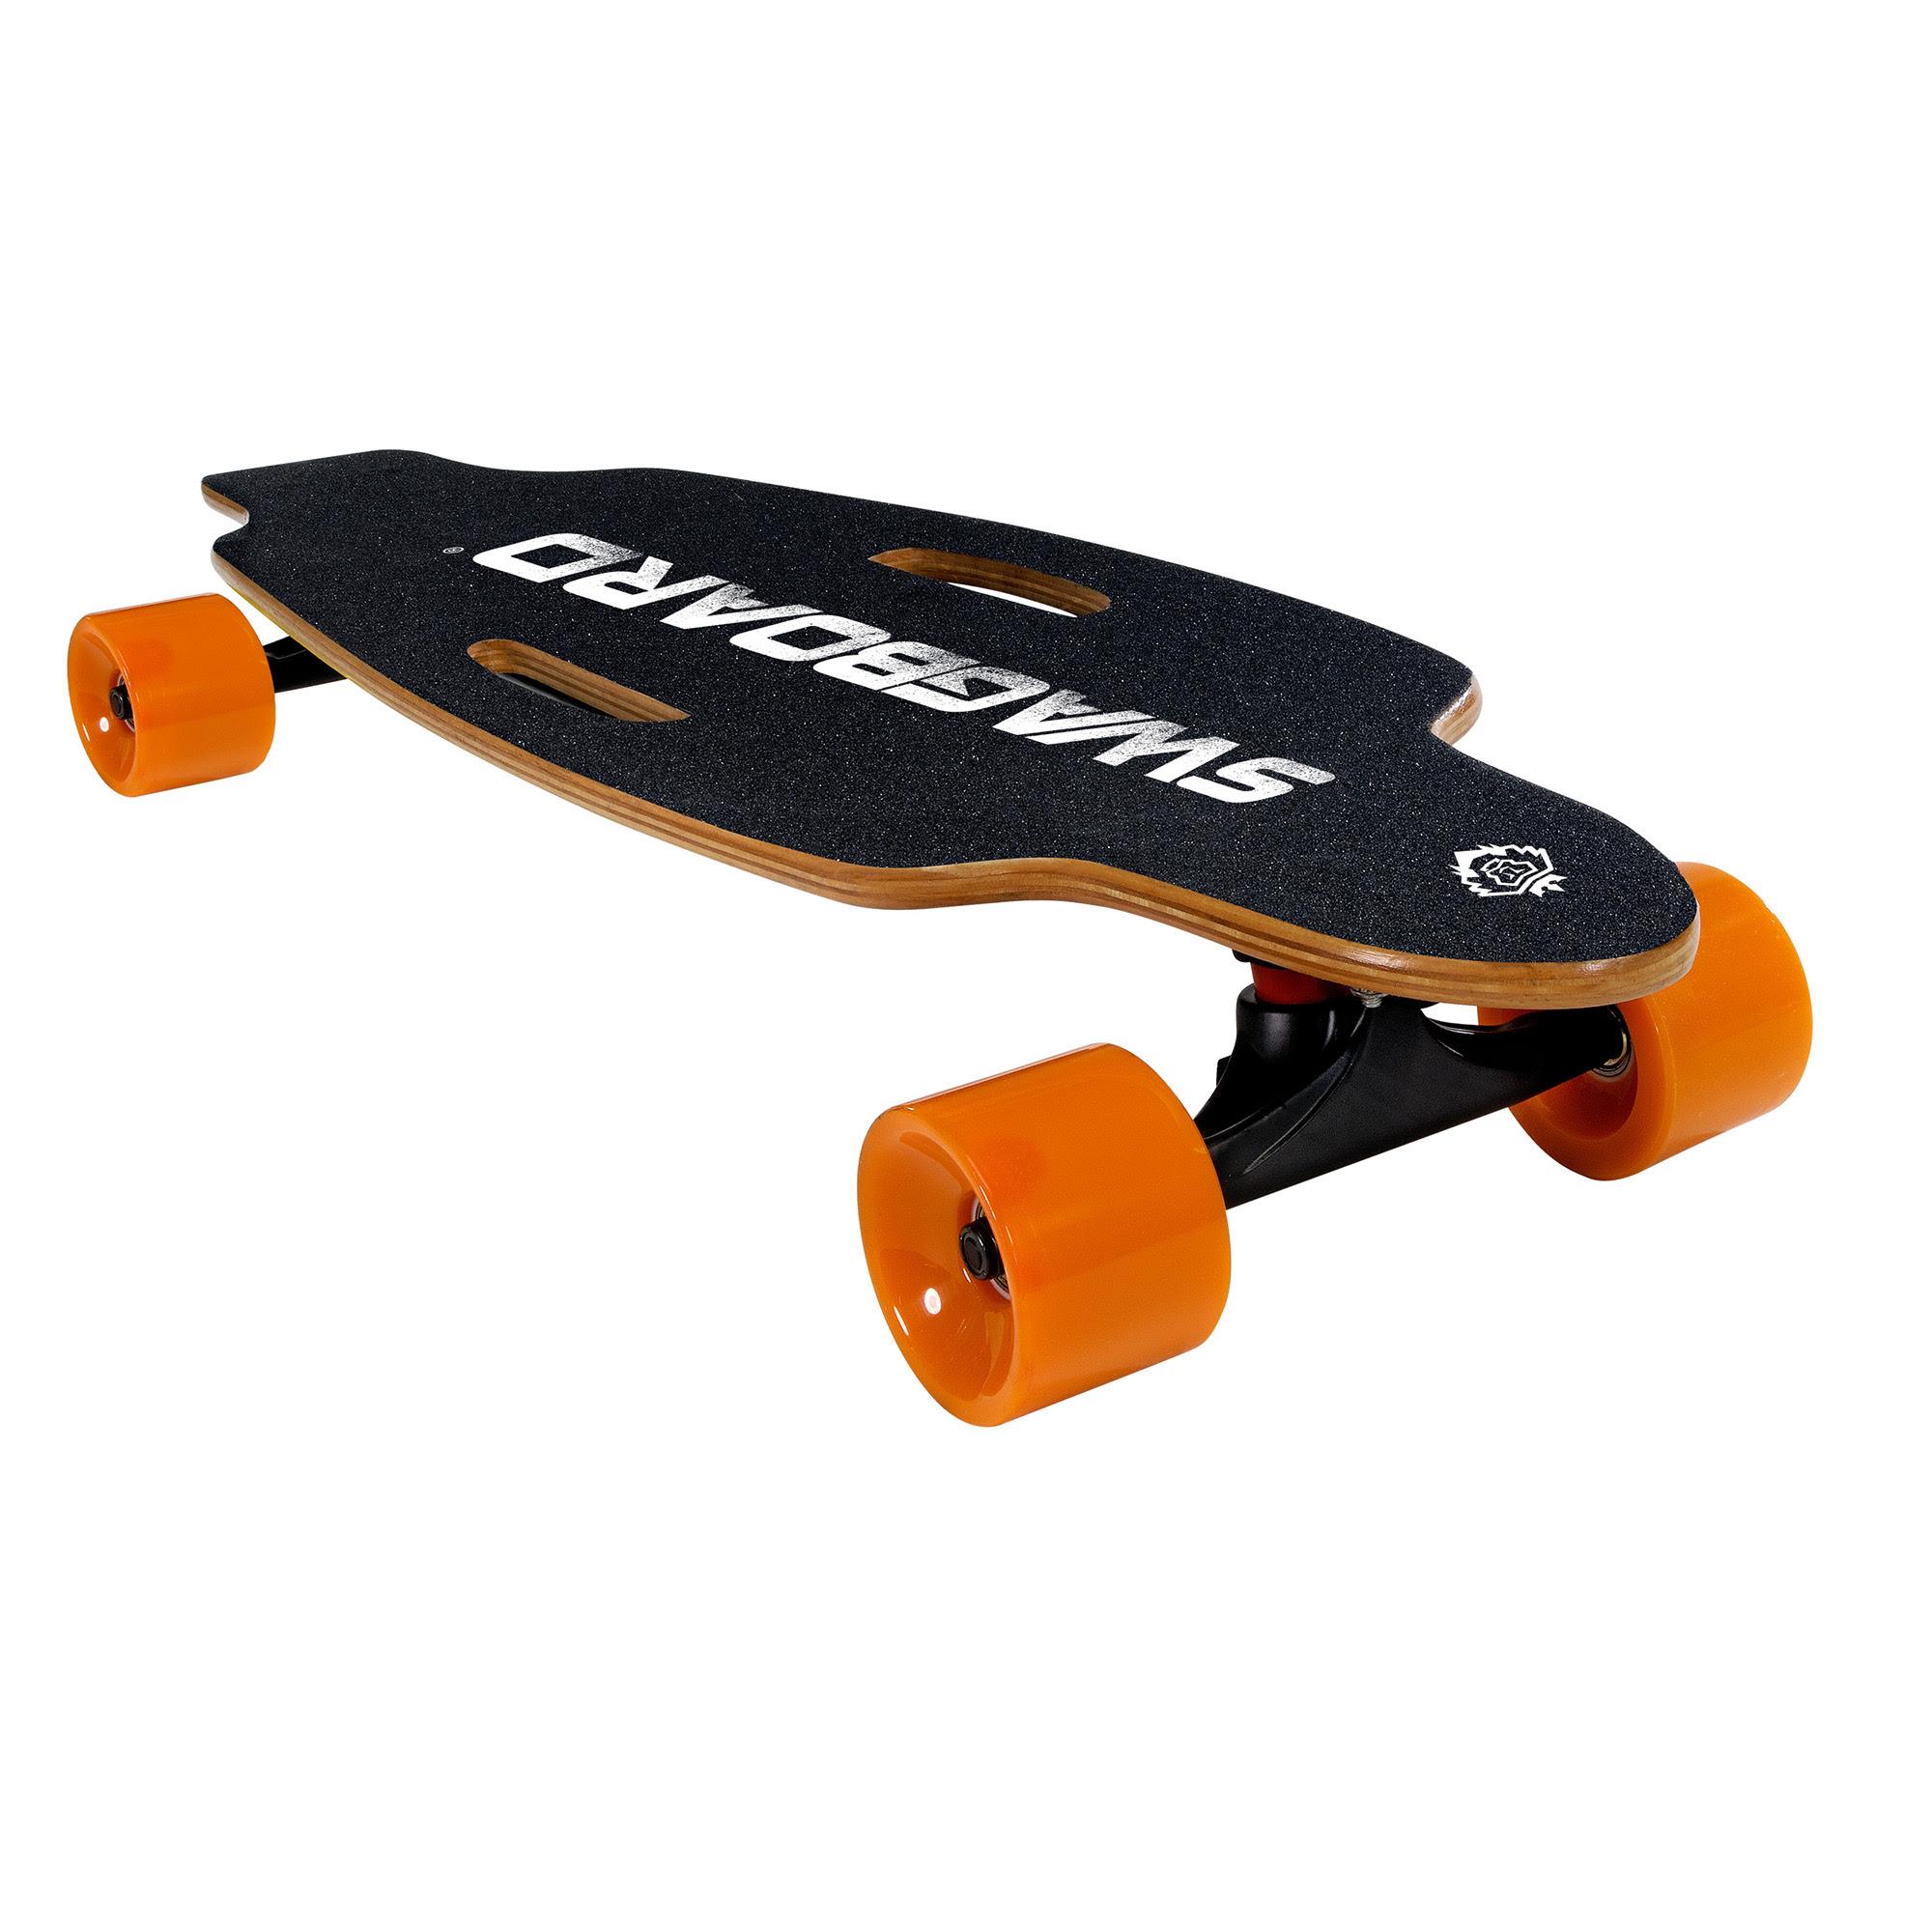 Swagtron Electric Skateboard longboard Bluetooth Remote \u0026 Maple Deck Swagboard  eBay